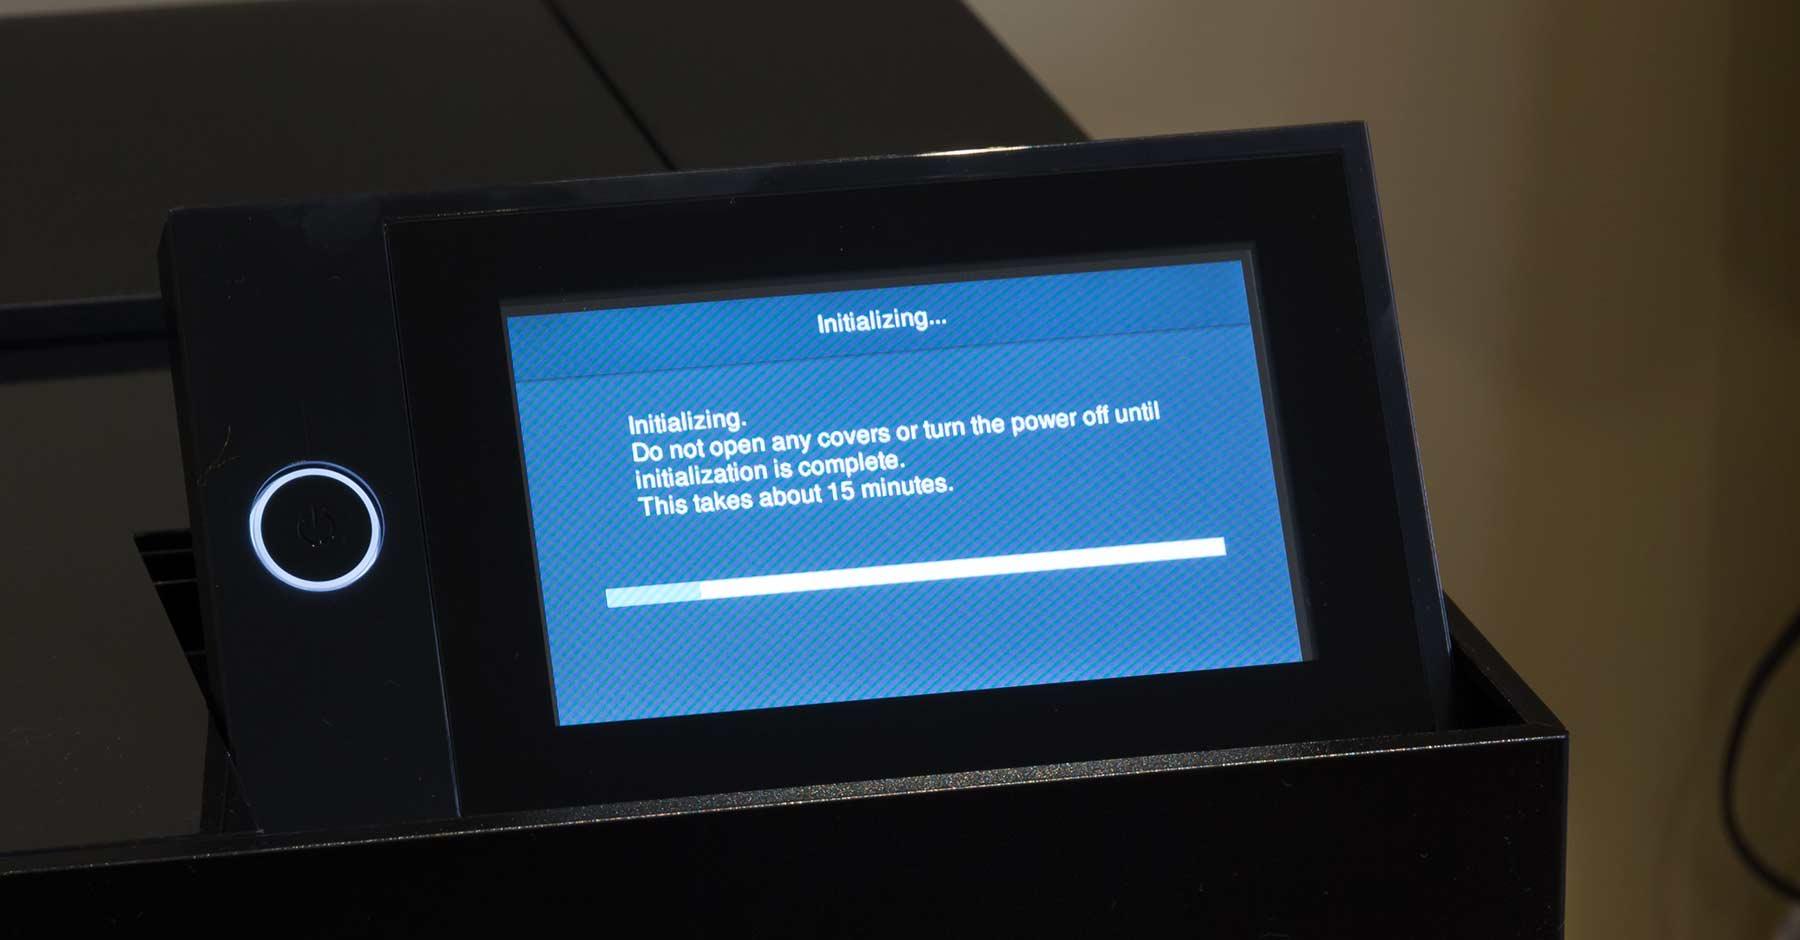 initialising the printer